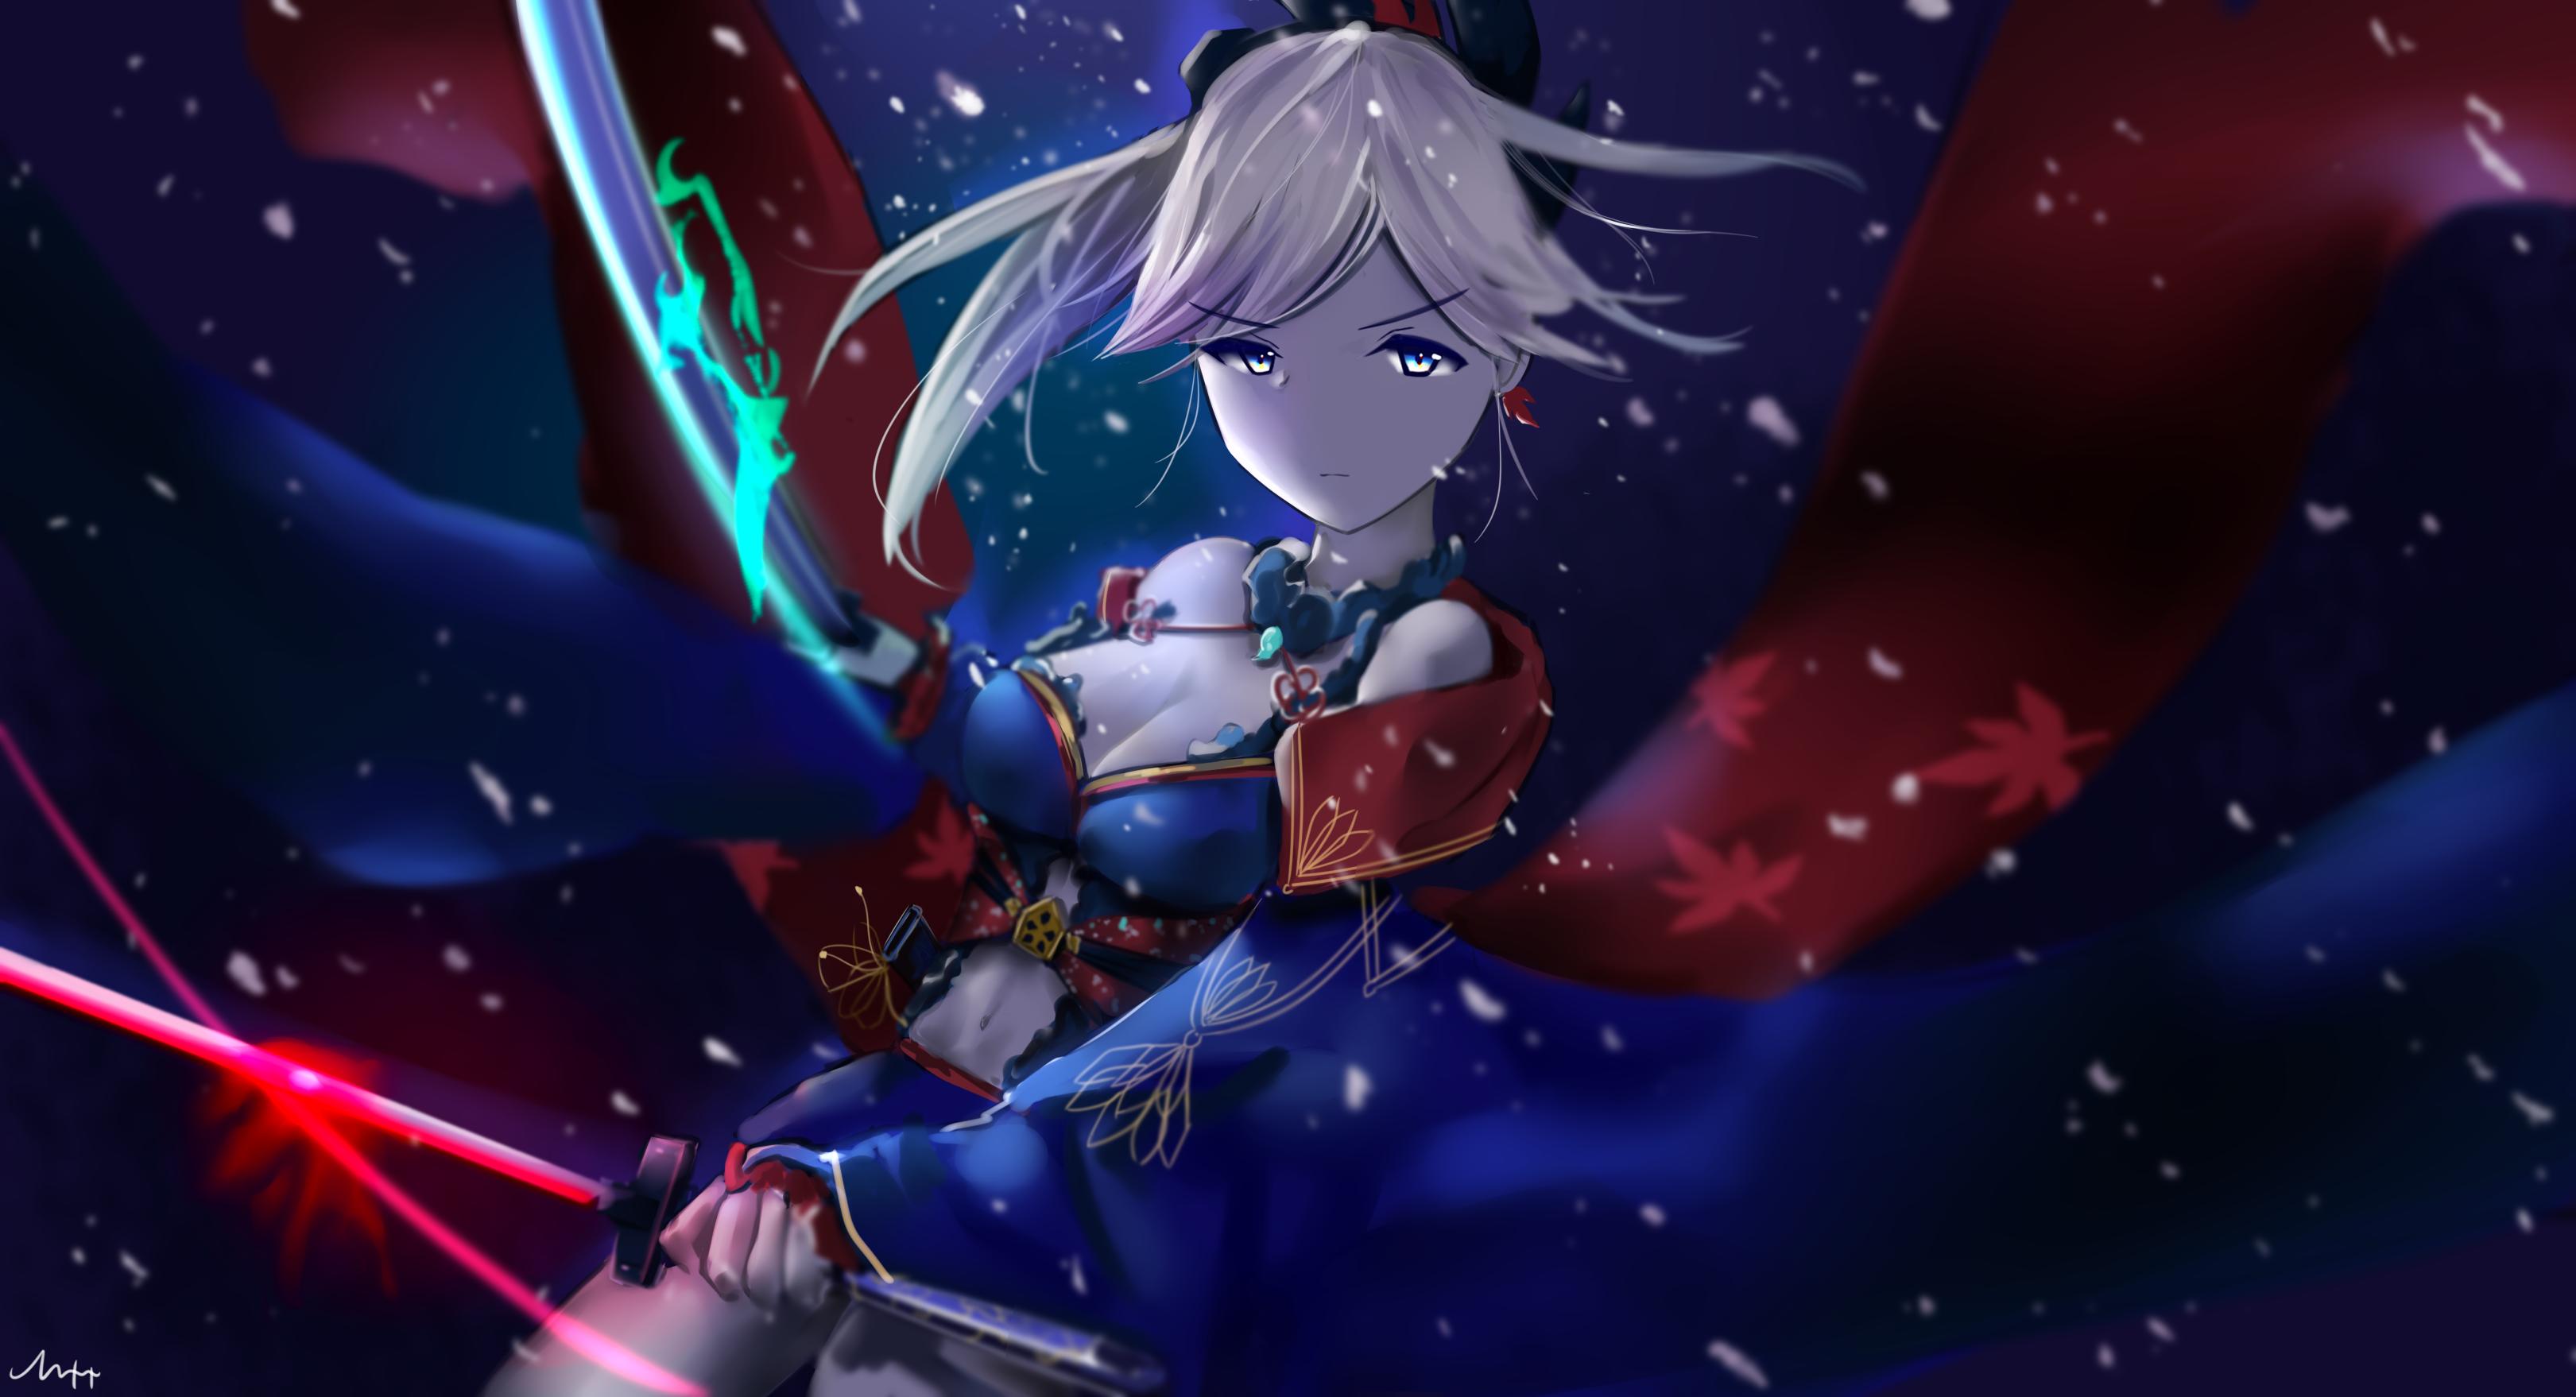 Miyamoto Musashi Fate Grand Order Miyamoto Musashi Musashi Anime